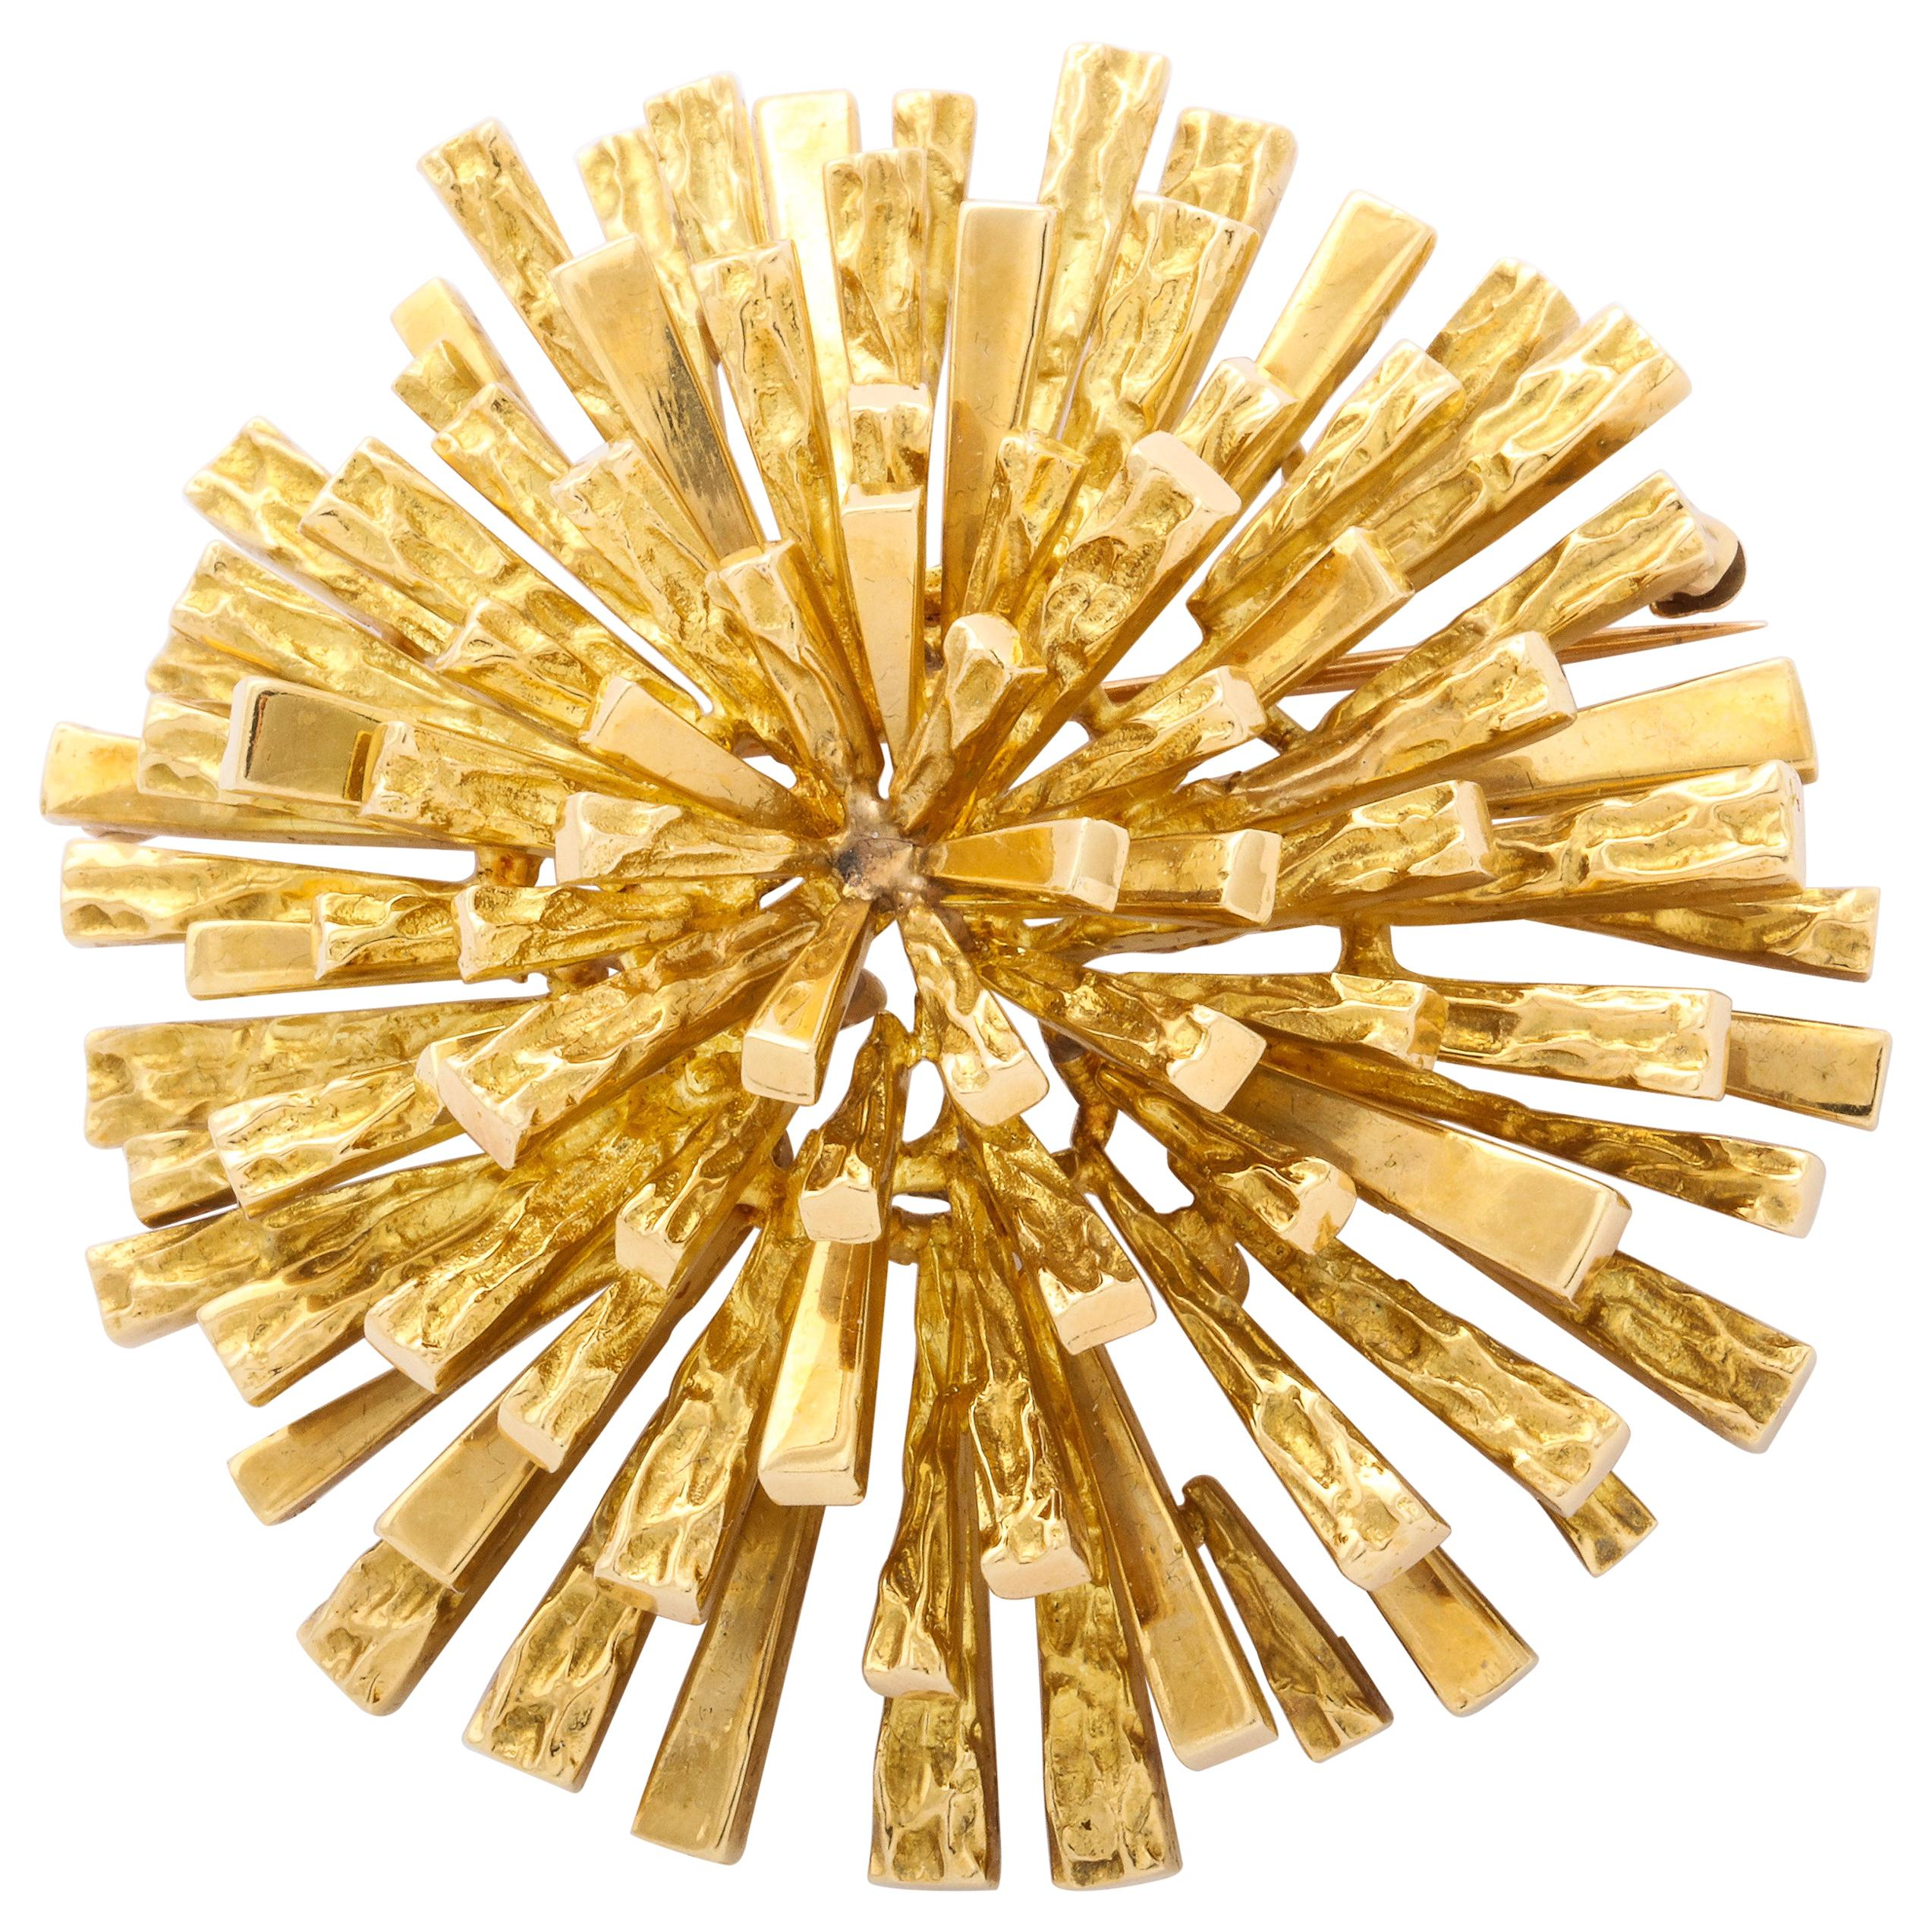 Tiffany & Co. Modernist Sunburst Gold Pendant Brooch